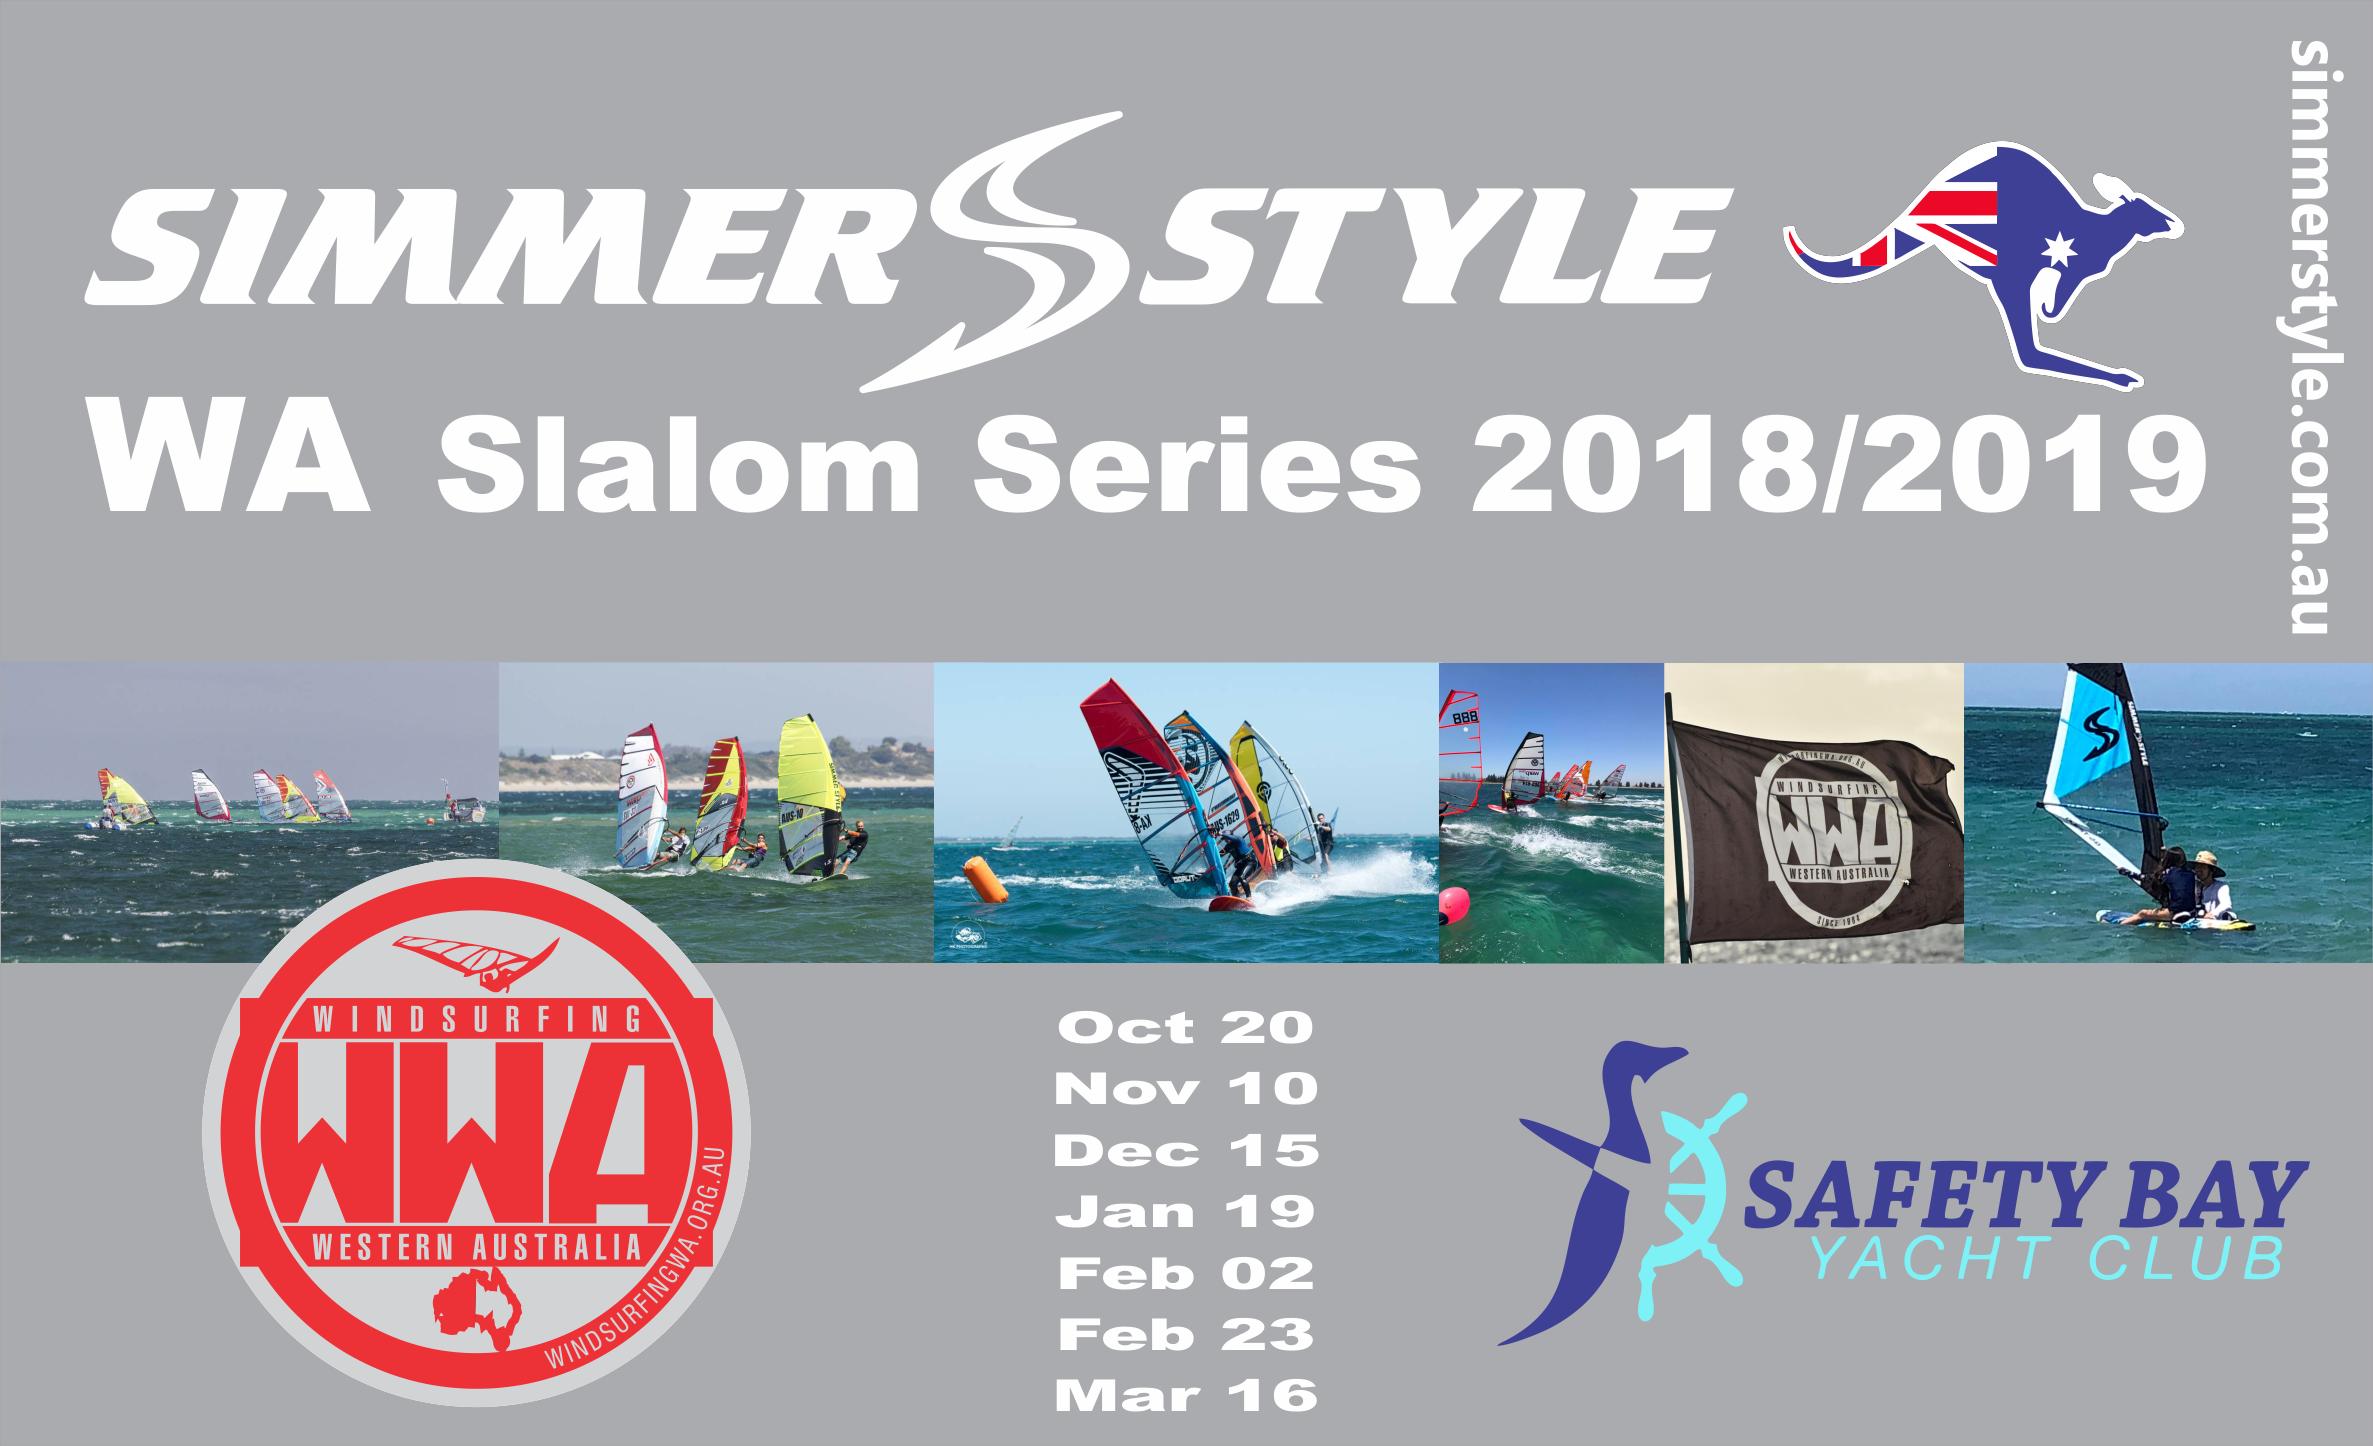 Simmer Style Slalom Series 2018 - 2019 | Windsurfing Western